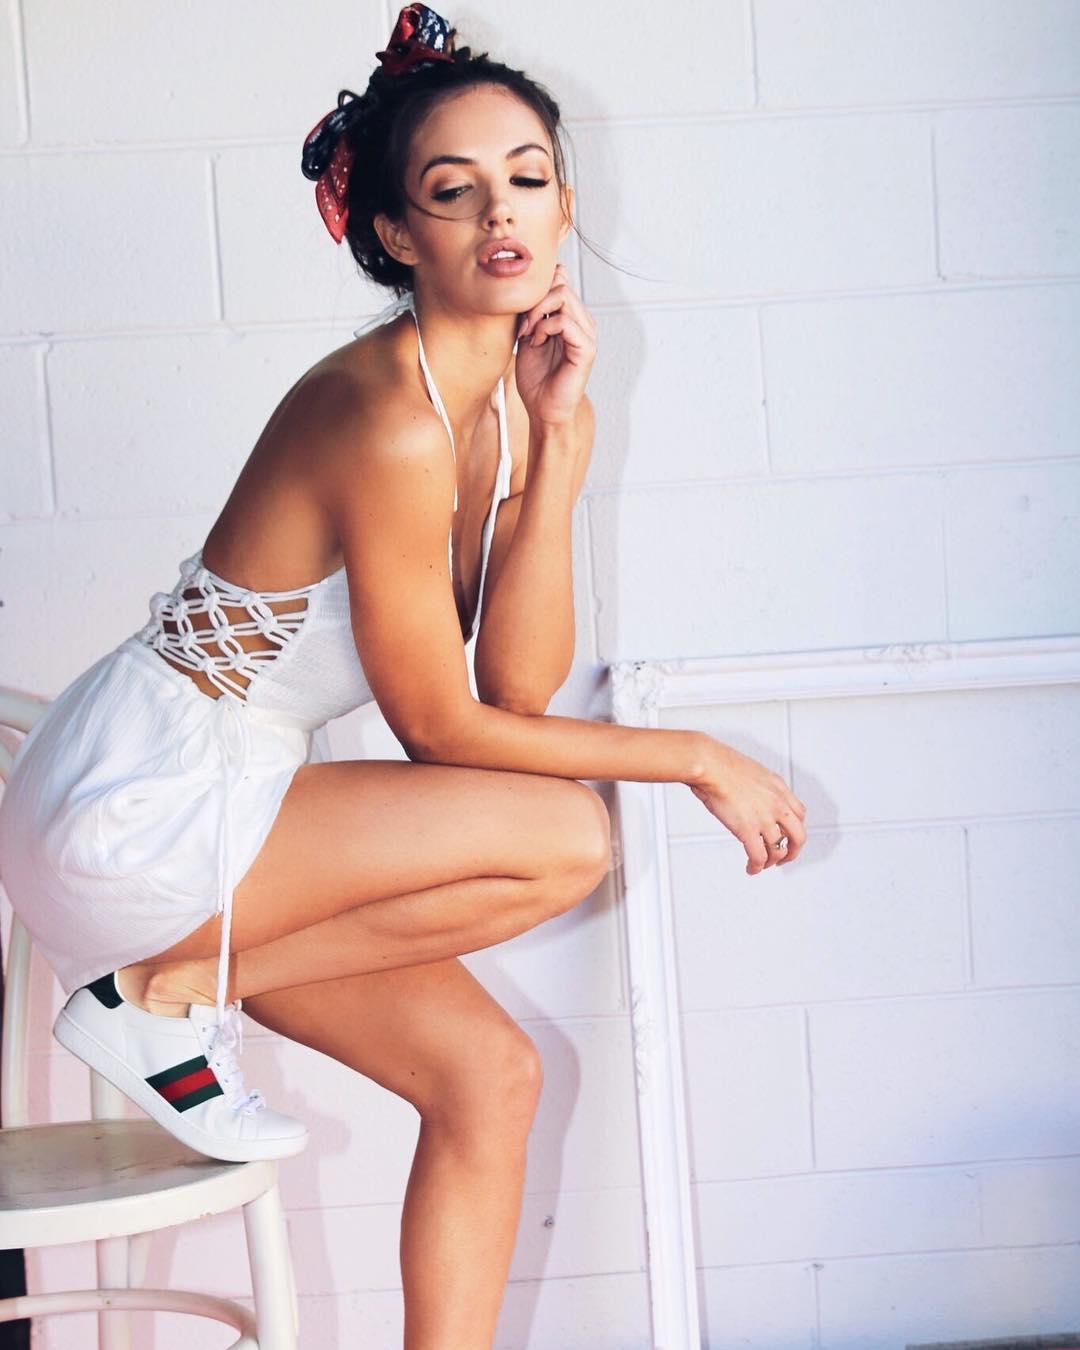 Amanda-Blanks-Wallpapers-Insta-Fit-Girls-14